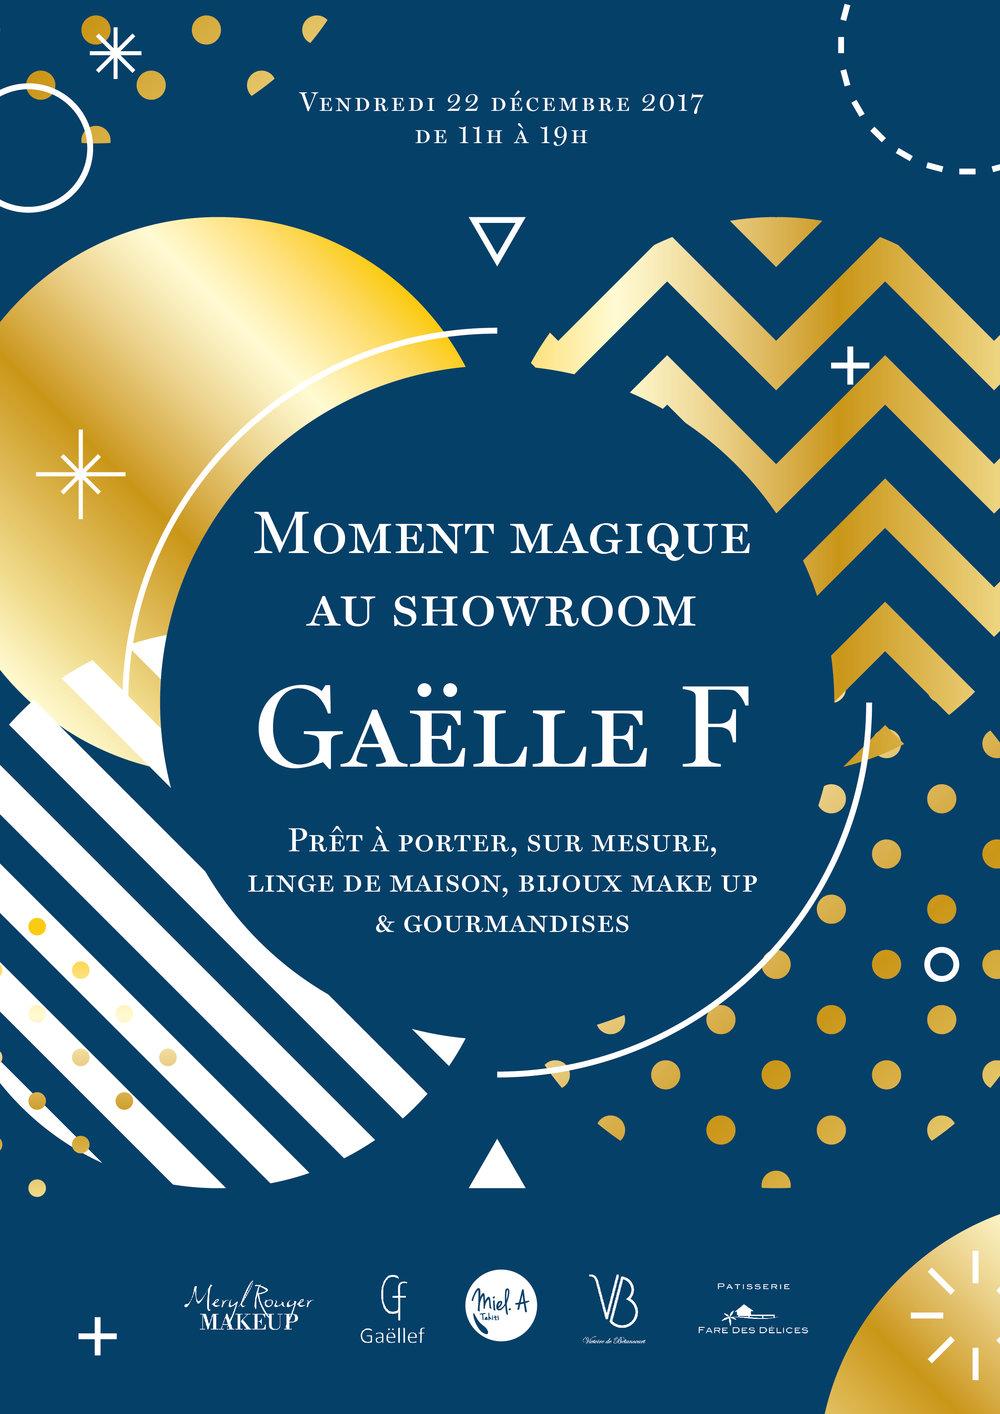 EVENT-GAELLEF-01.jpg